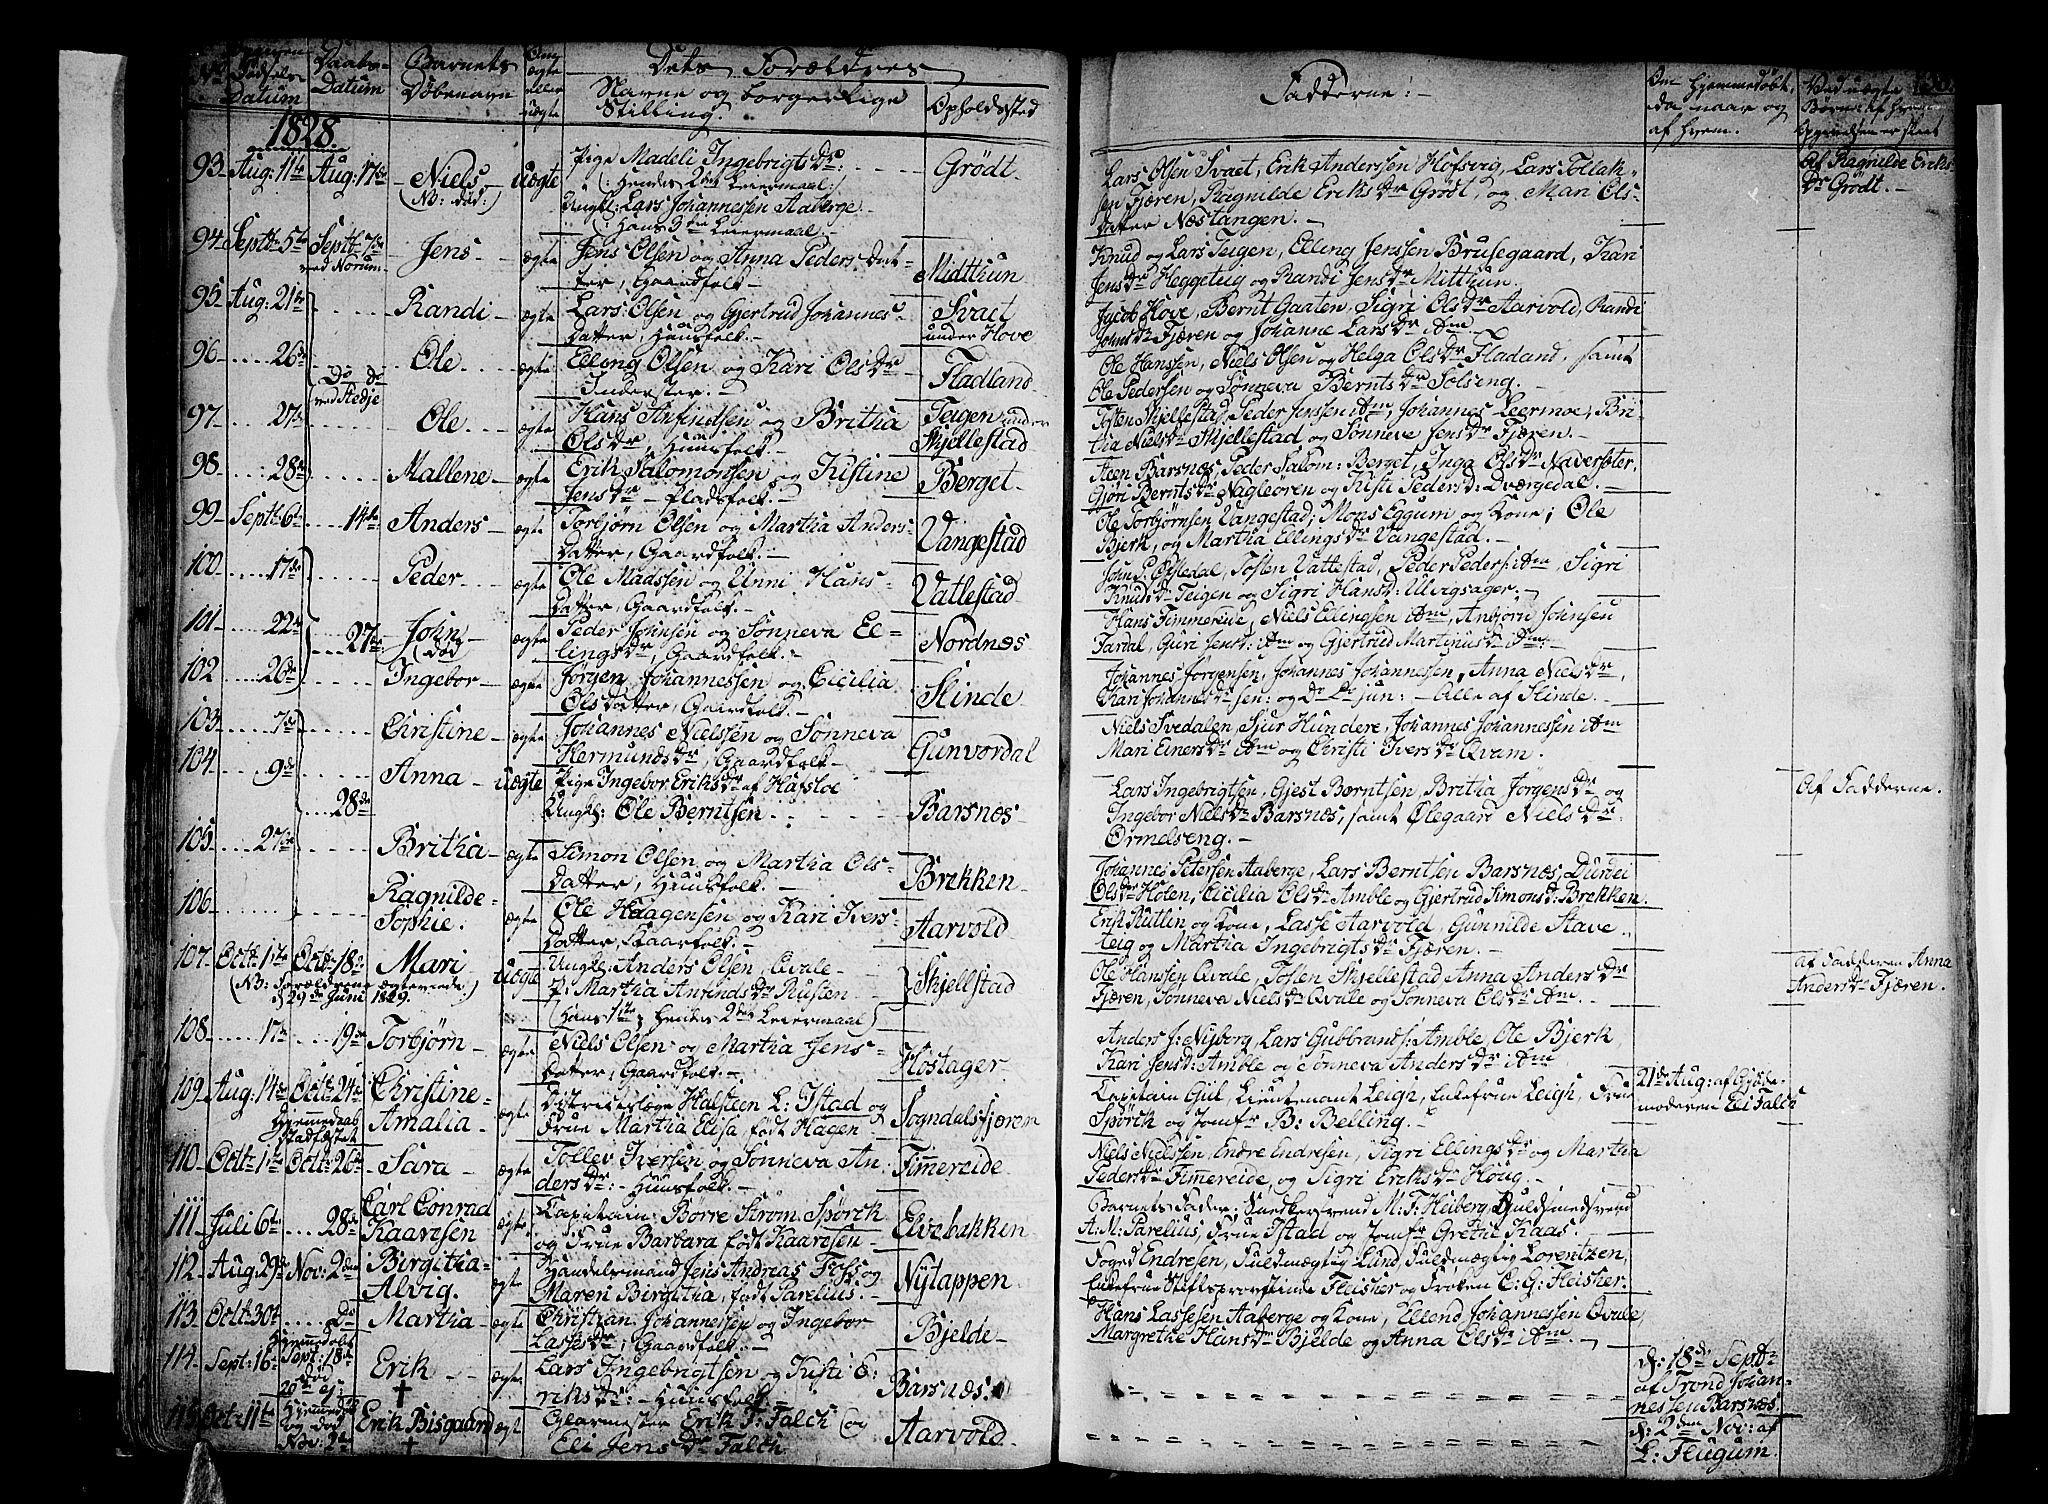 SAB, Sogndal sokneprestembete, H/Haa/Haaa/L0010: Ministerialbok nr. A 10, 1821-1838, s. 38